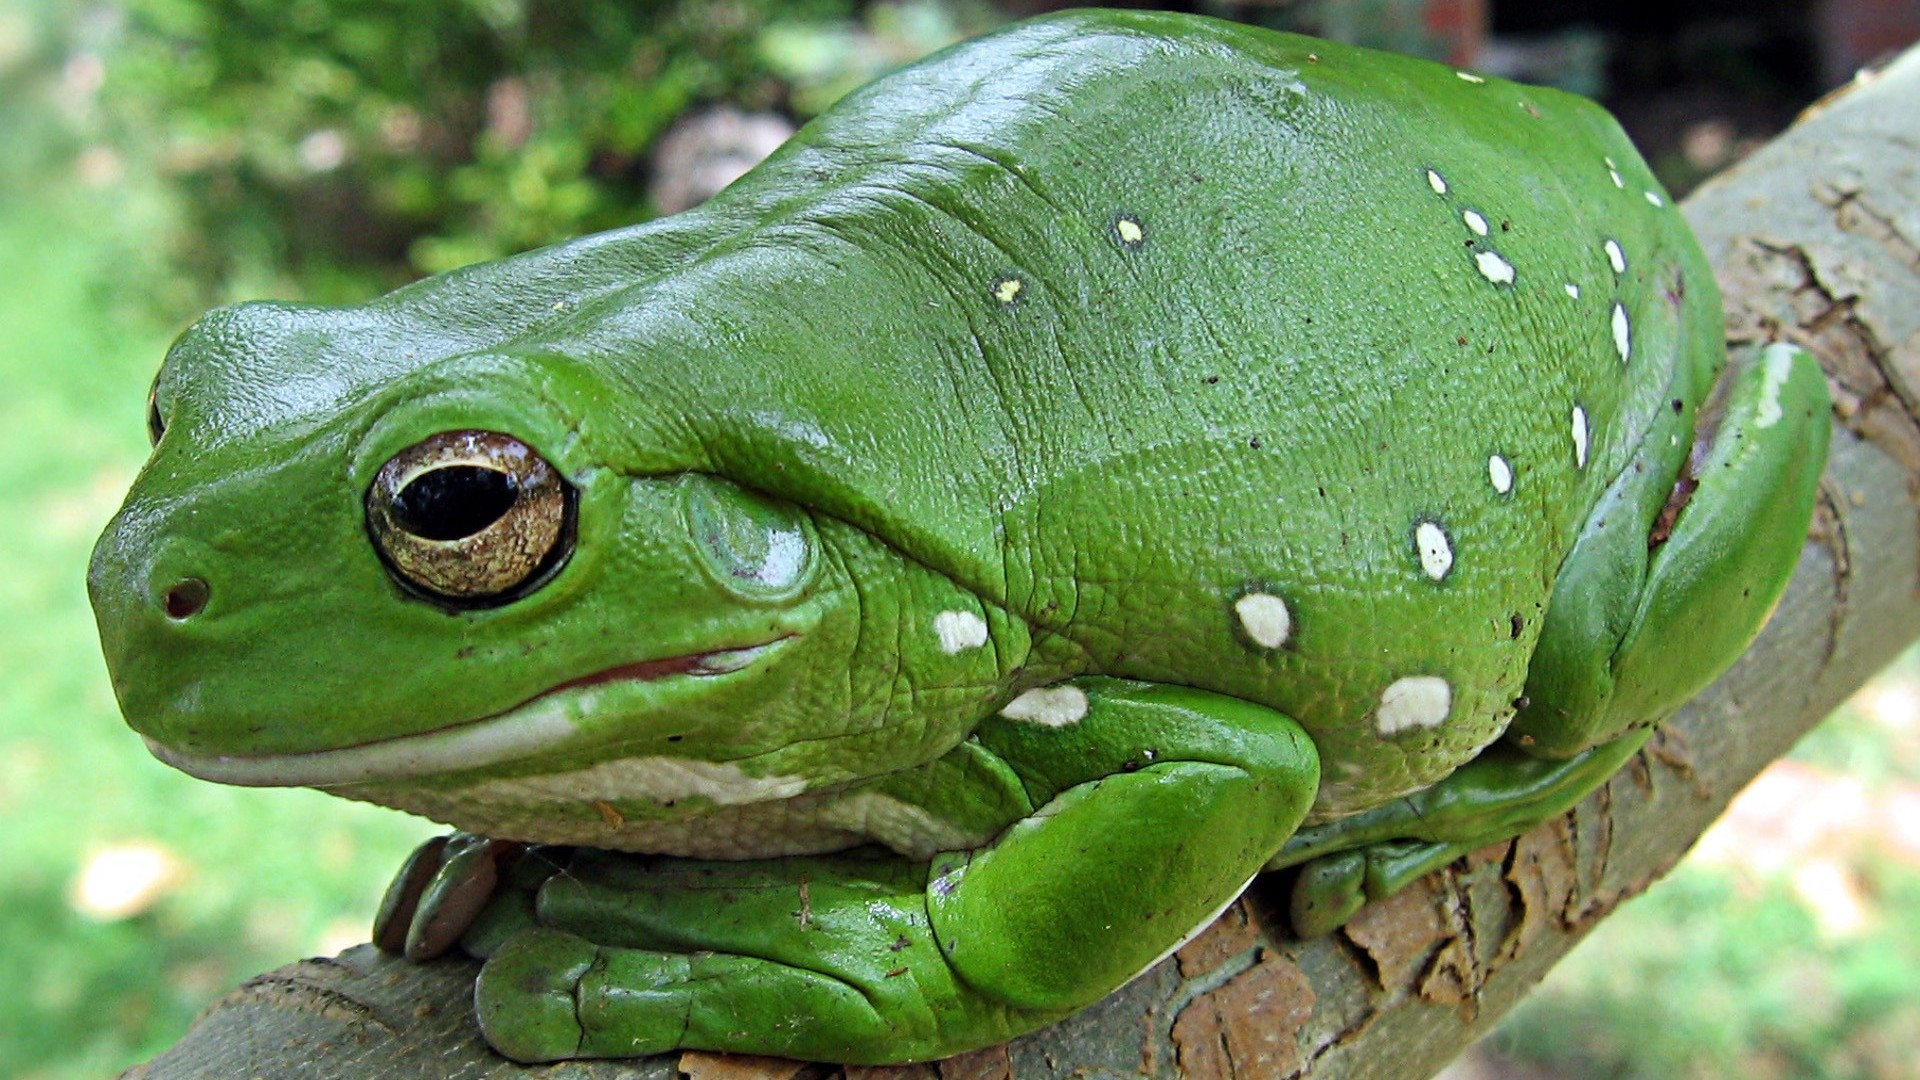 Amphibians wallpaper 1920x1080 58019 1920x1080